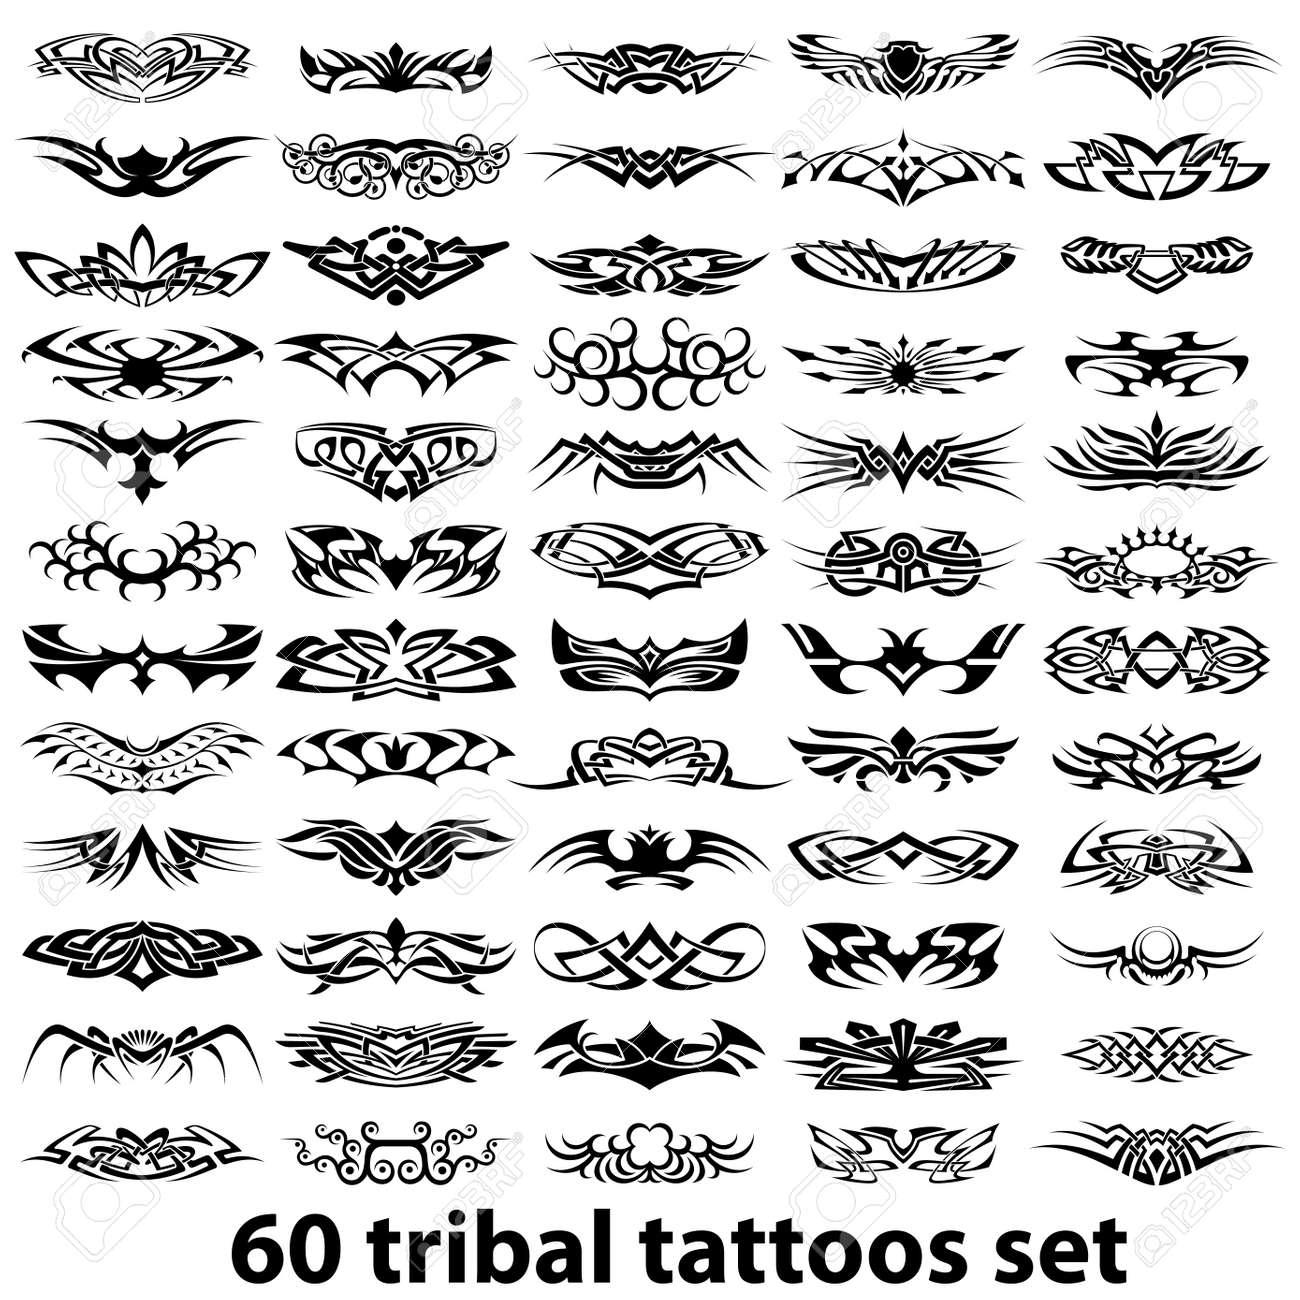 60 various tribal tattoos Stock Vector - 13068698